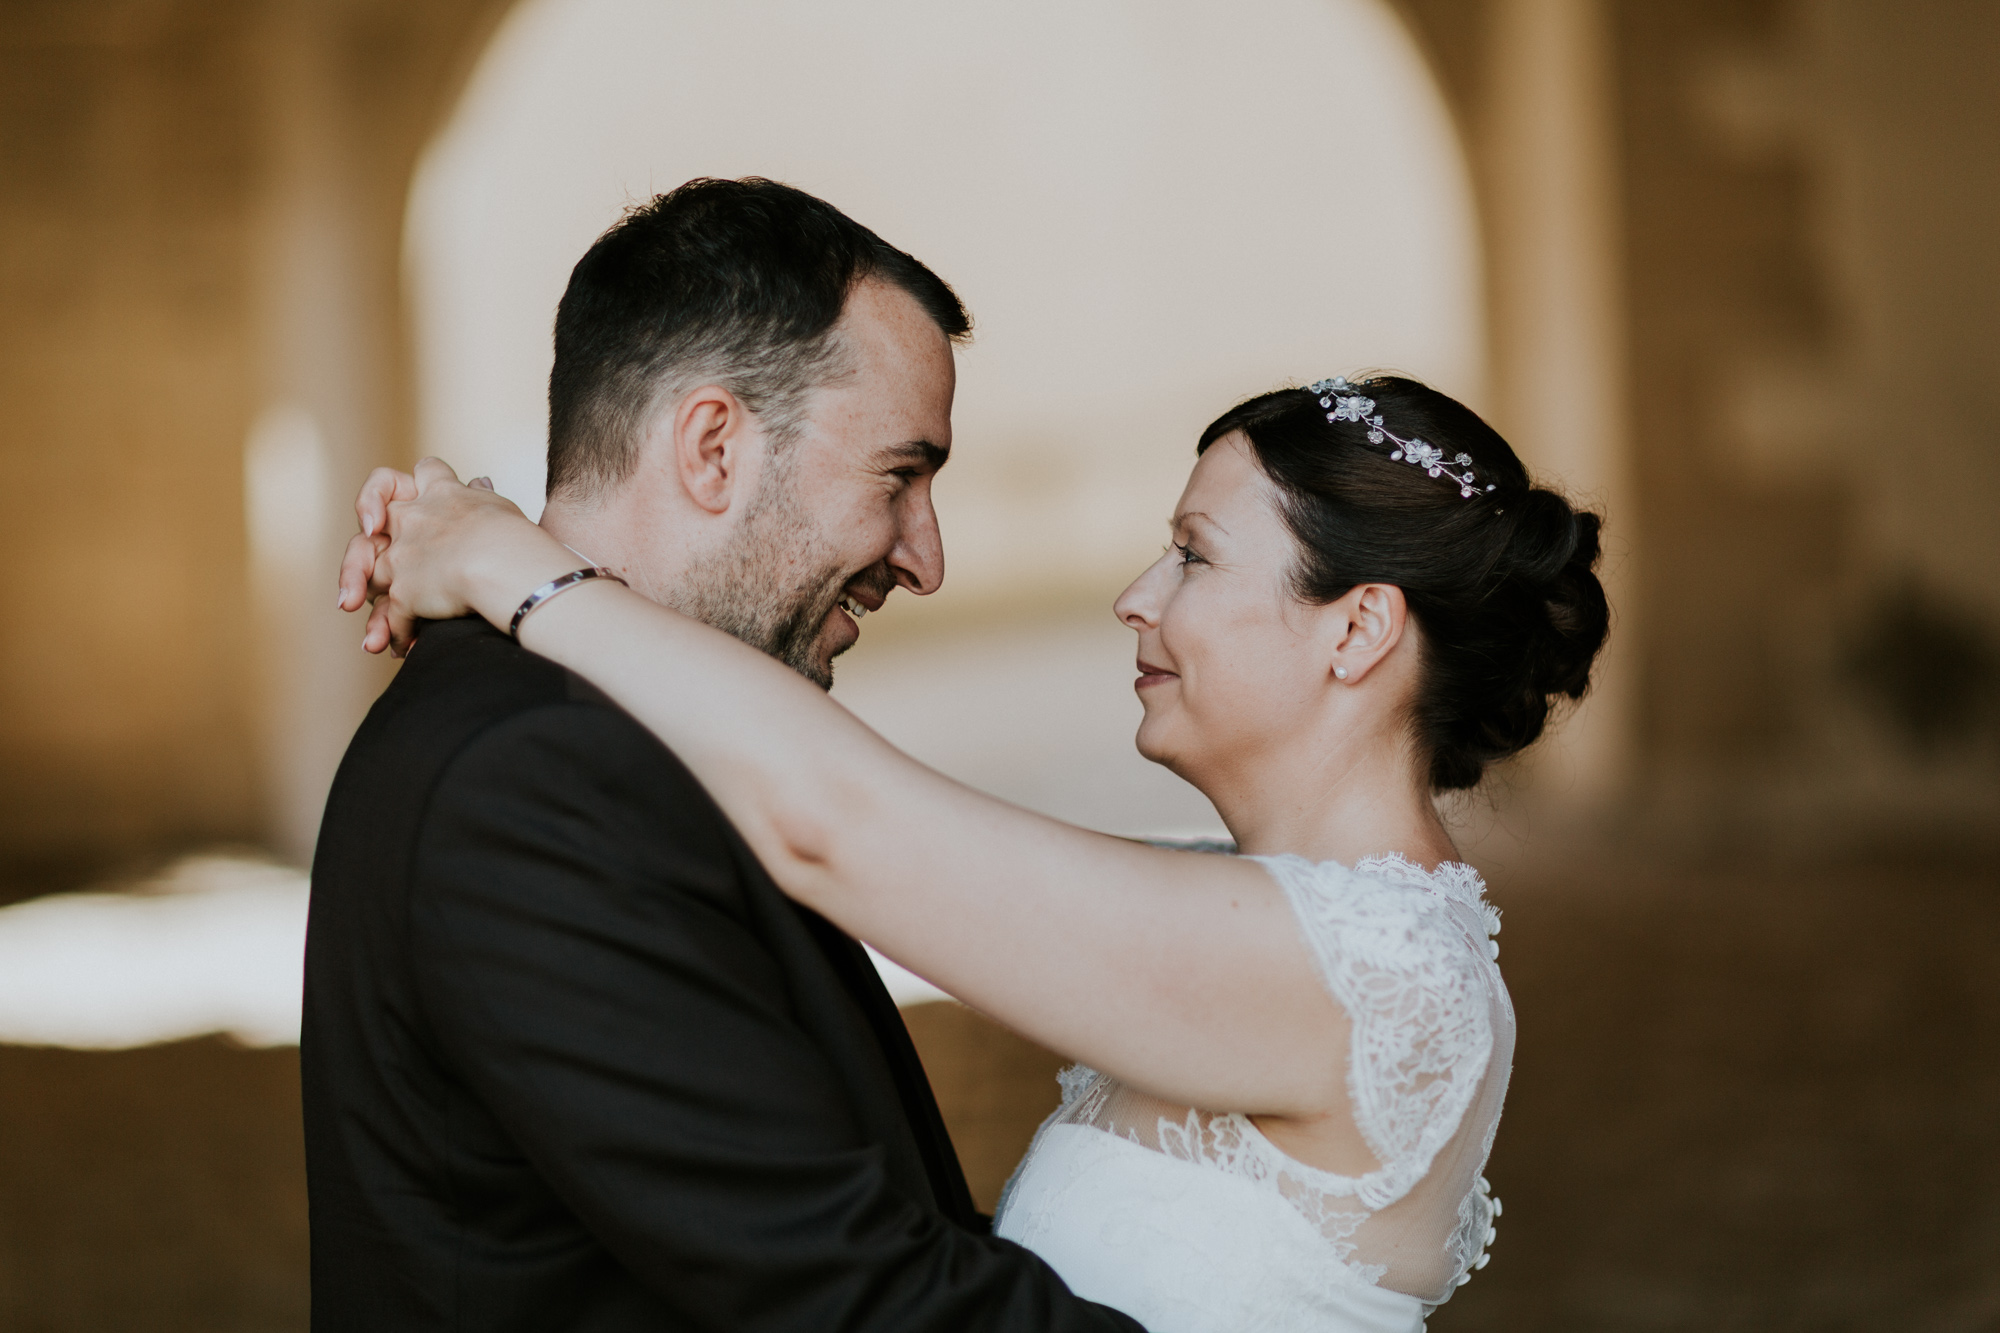 Brautpaarfotos am Schloss Hellenstein.jpg